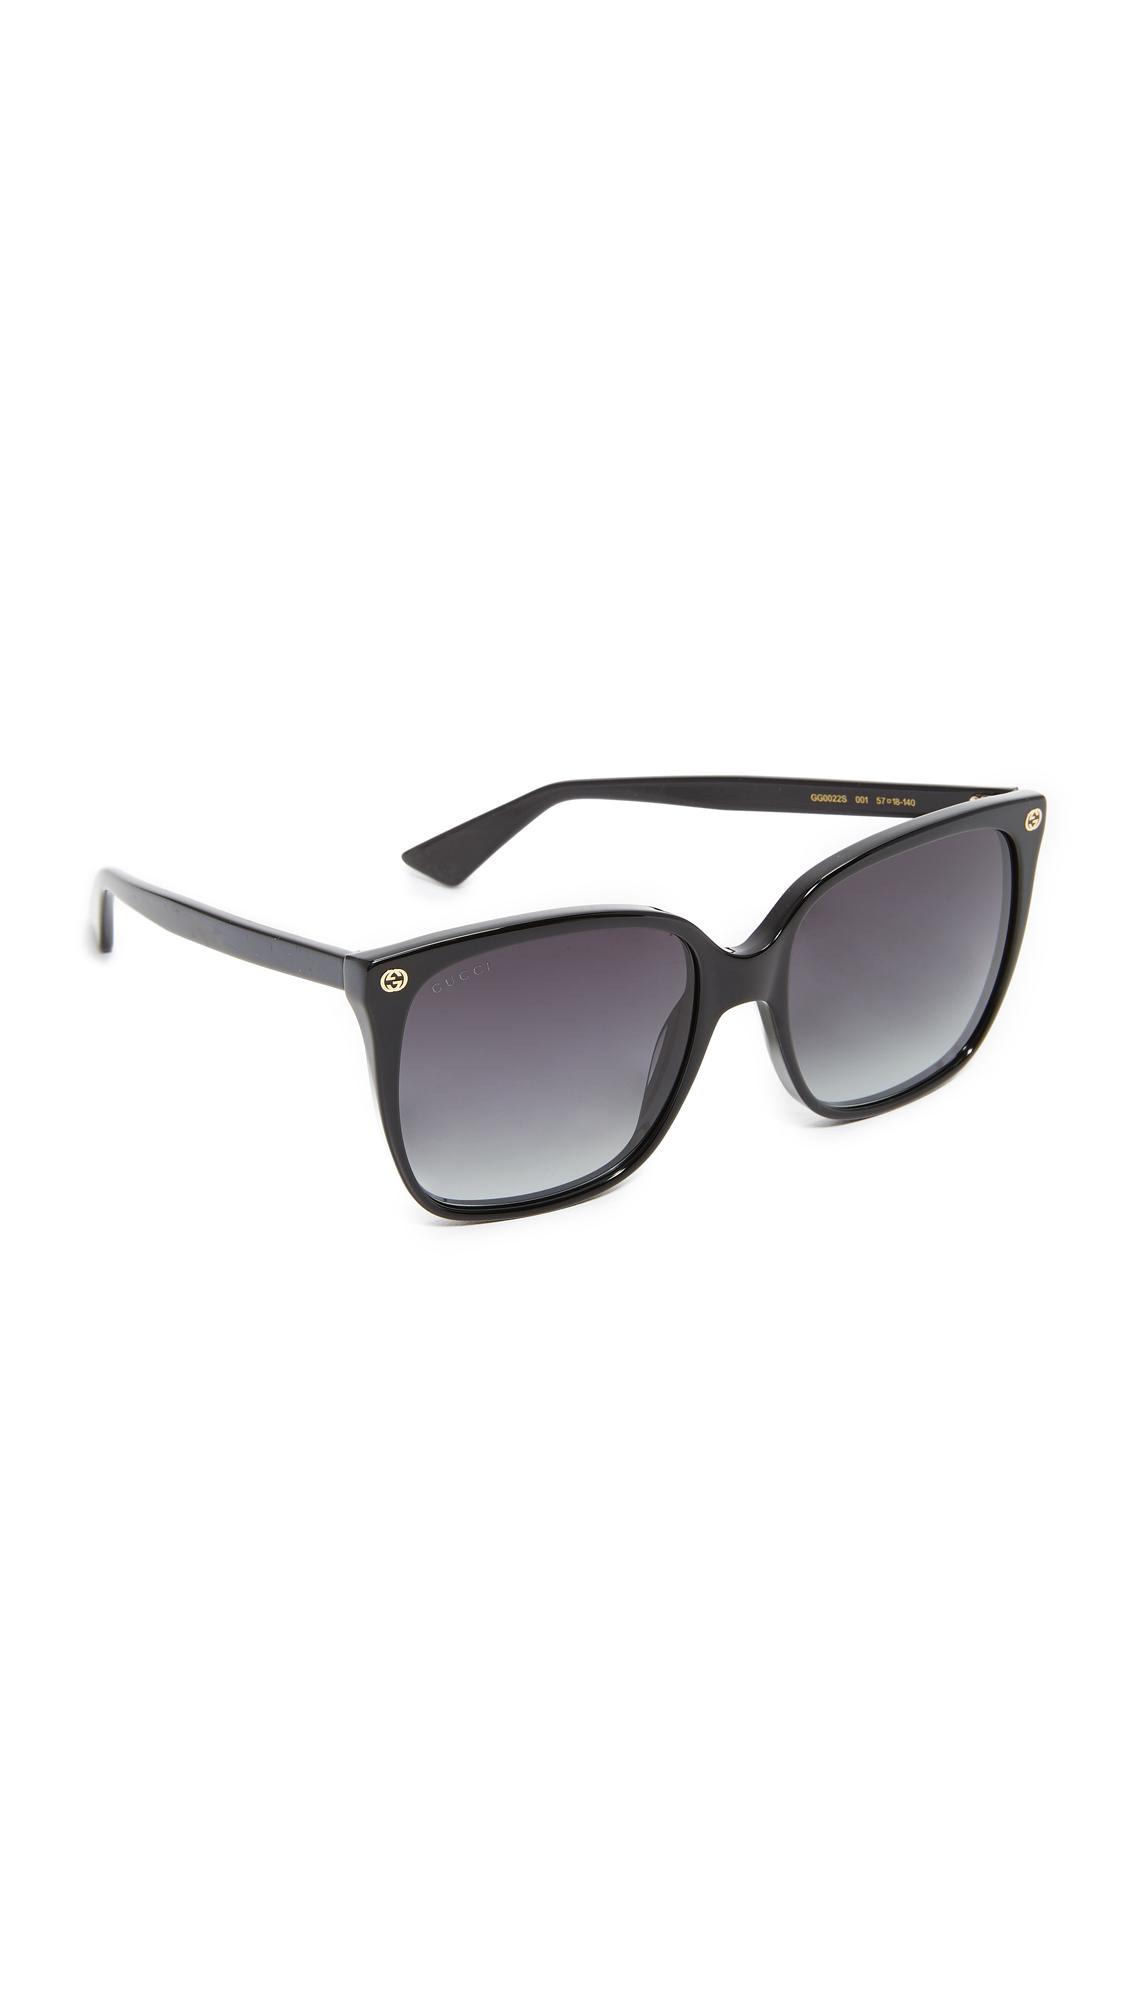 Gucci Lightness Square Sunglasses - Black/Grey at Shopbop